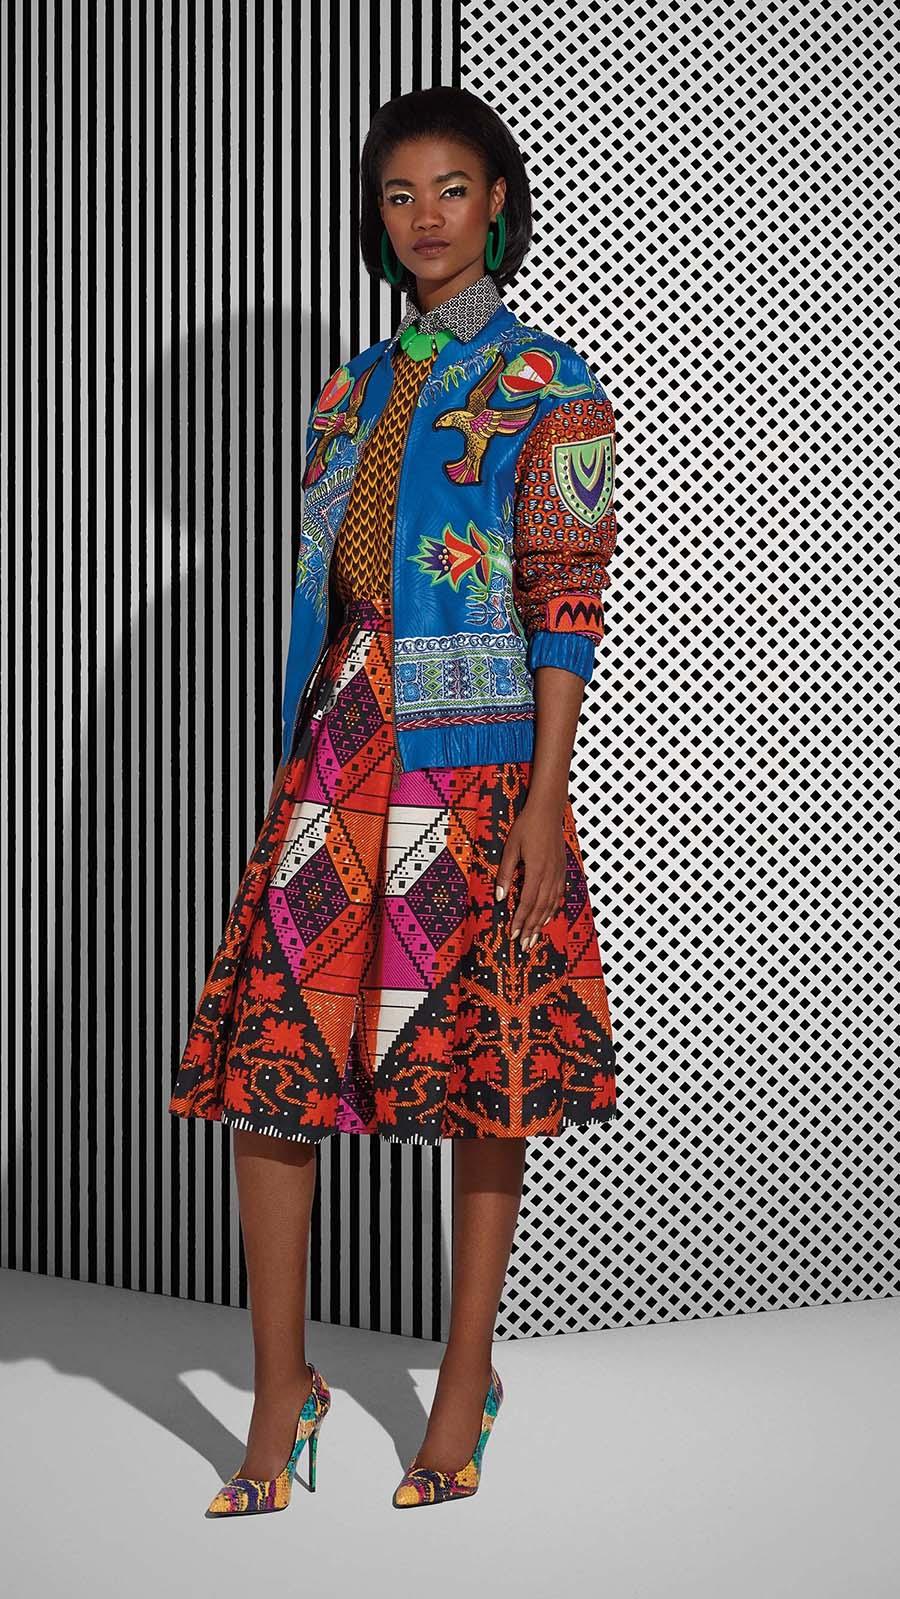 griot-mag-afrosalt-boho-Moda e tessuti | Judith Ambusu Akuma ci apre le porte al Rinascimento Africano_wax